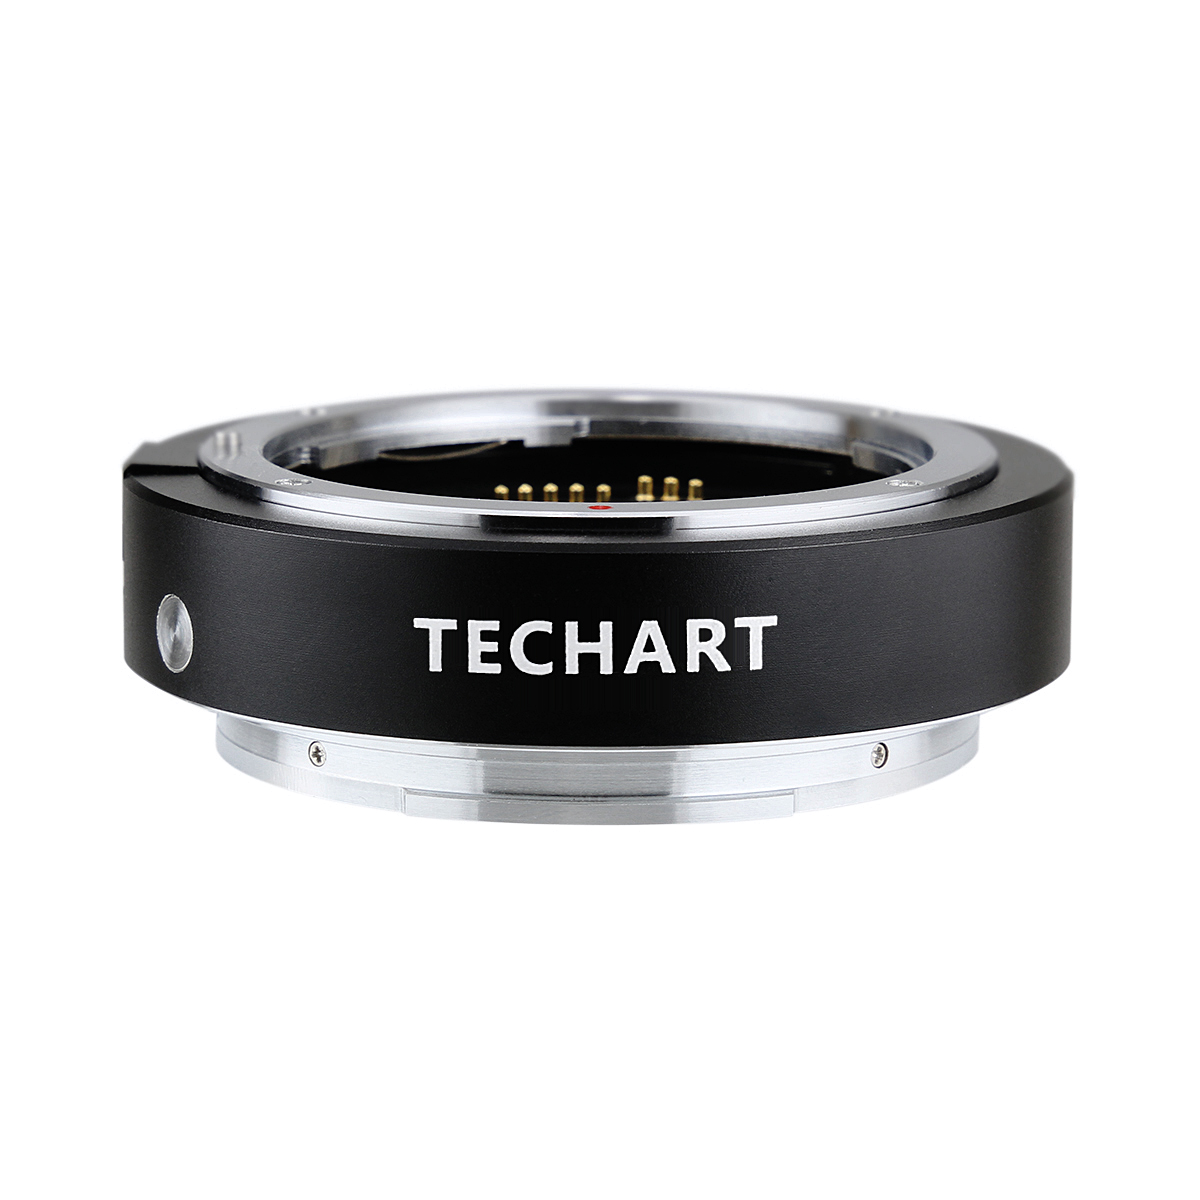 TECHART EF-FG01(キヤノンEFマウントレンズ → 富士フイルムGマウント変換)電子接点付きマウントアダプター ※生産終了